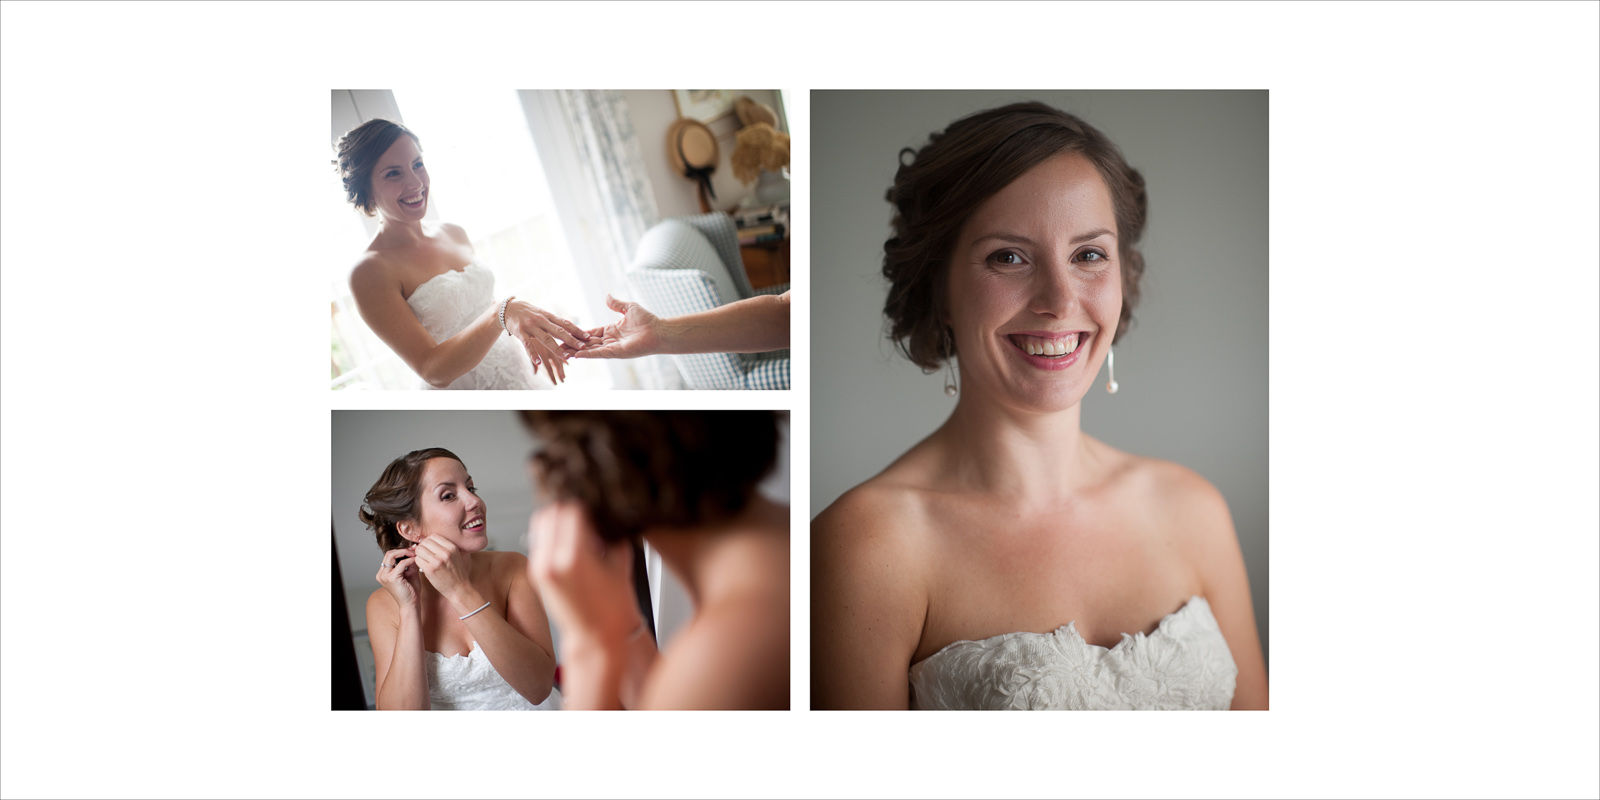 collingwood-wedding-photo-album-004.jpg